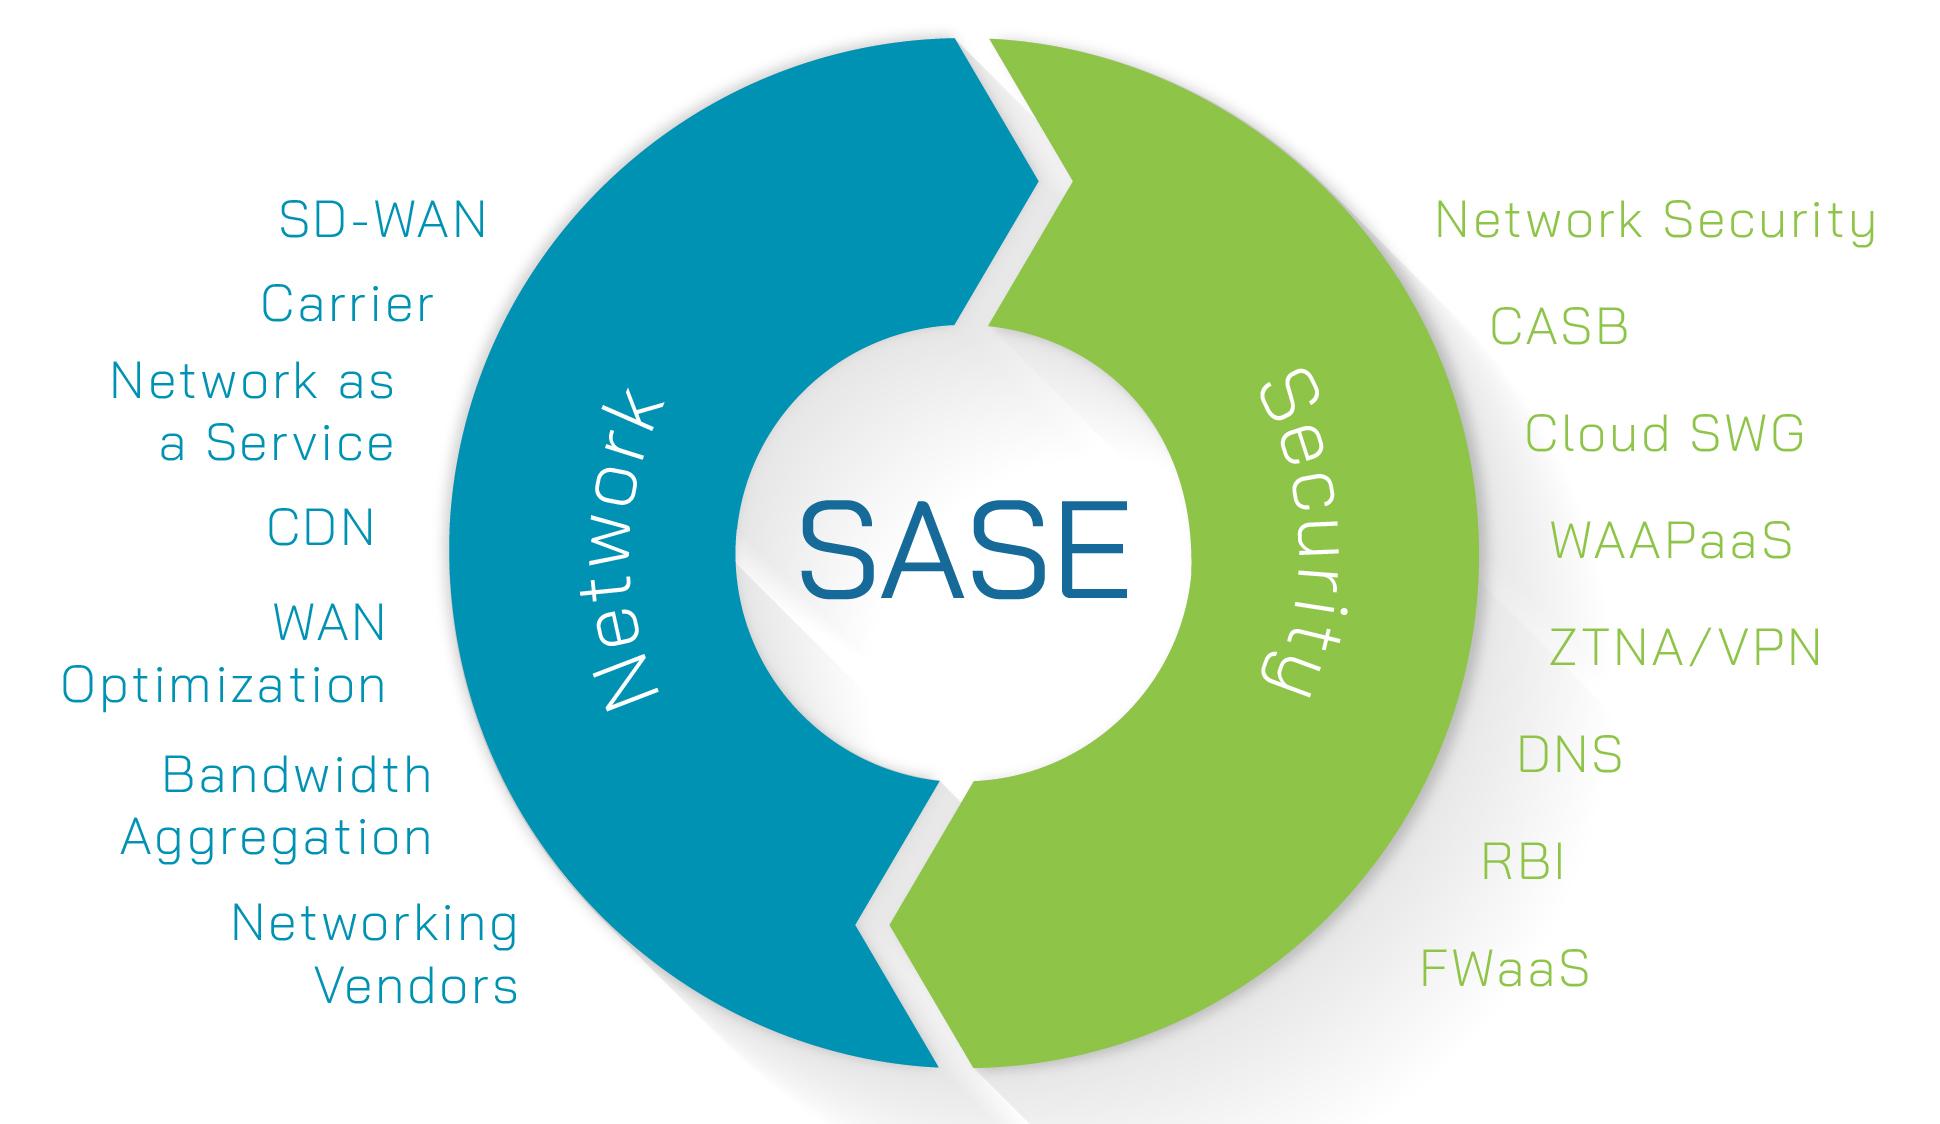 SASE - Secure Access Service Edge